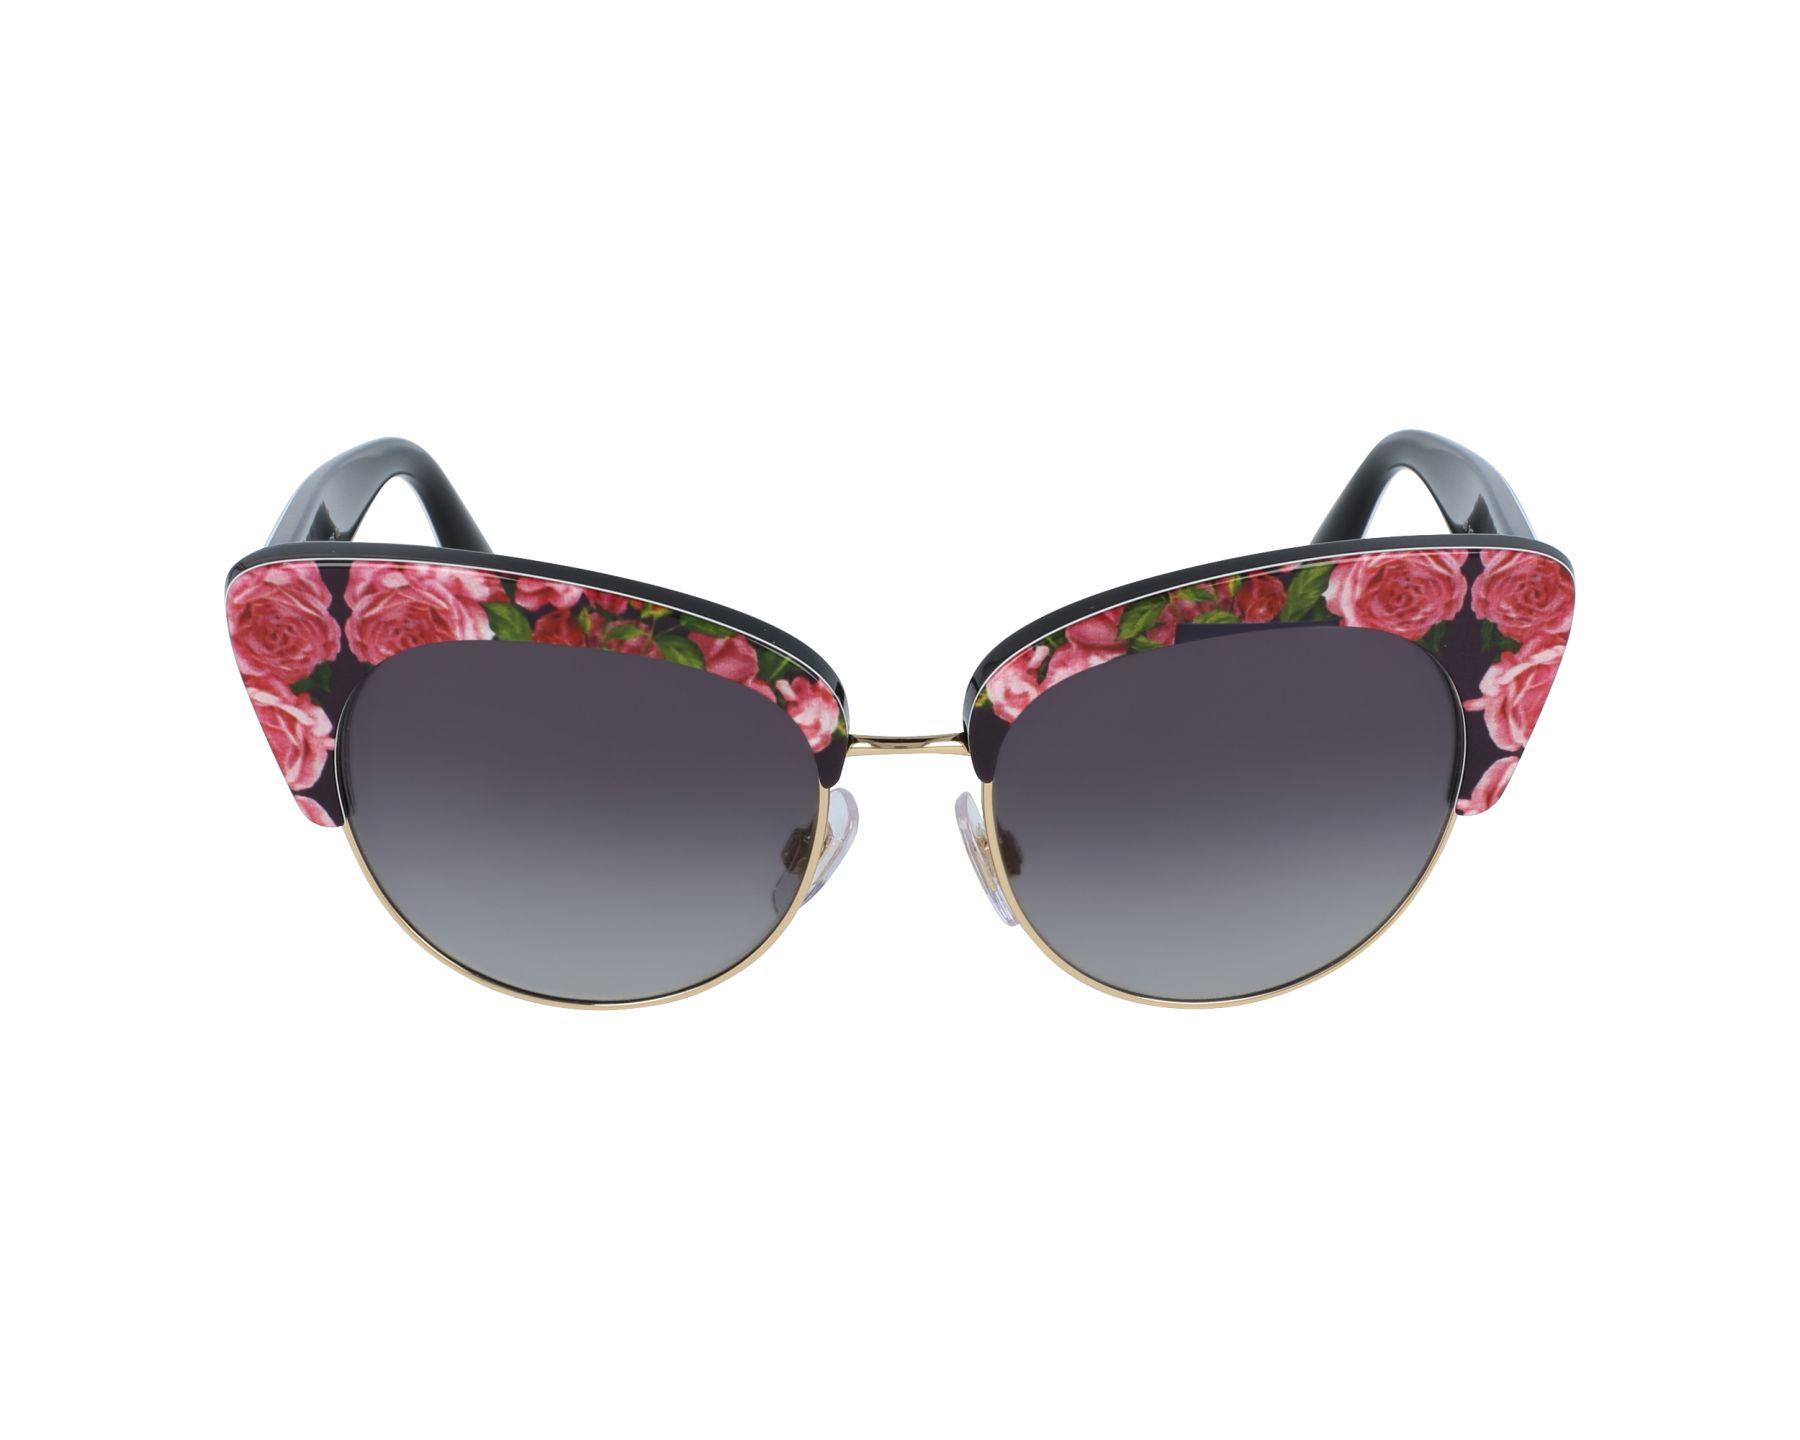 3b2b8c4e3db Sunglasses Dolce   Gabbana DG-4277 3127 8G 52-17 Red Black profile